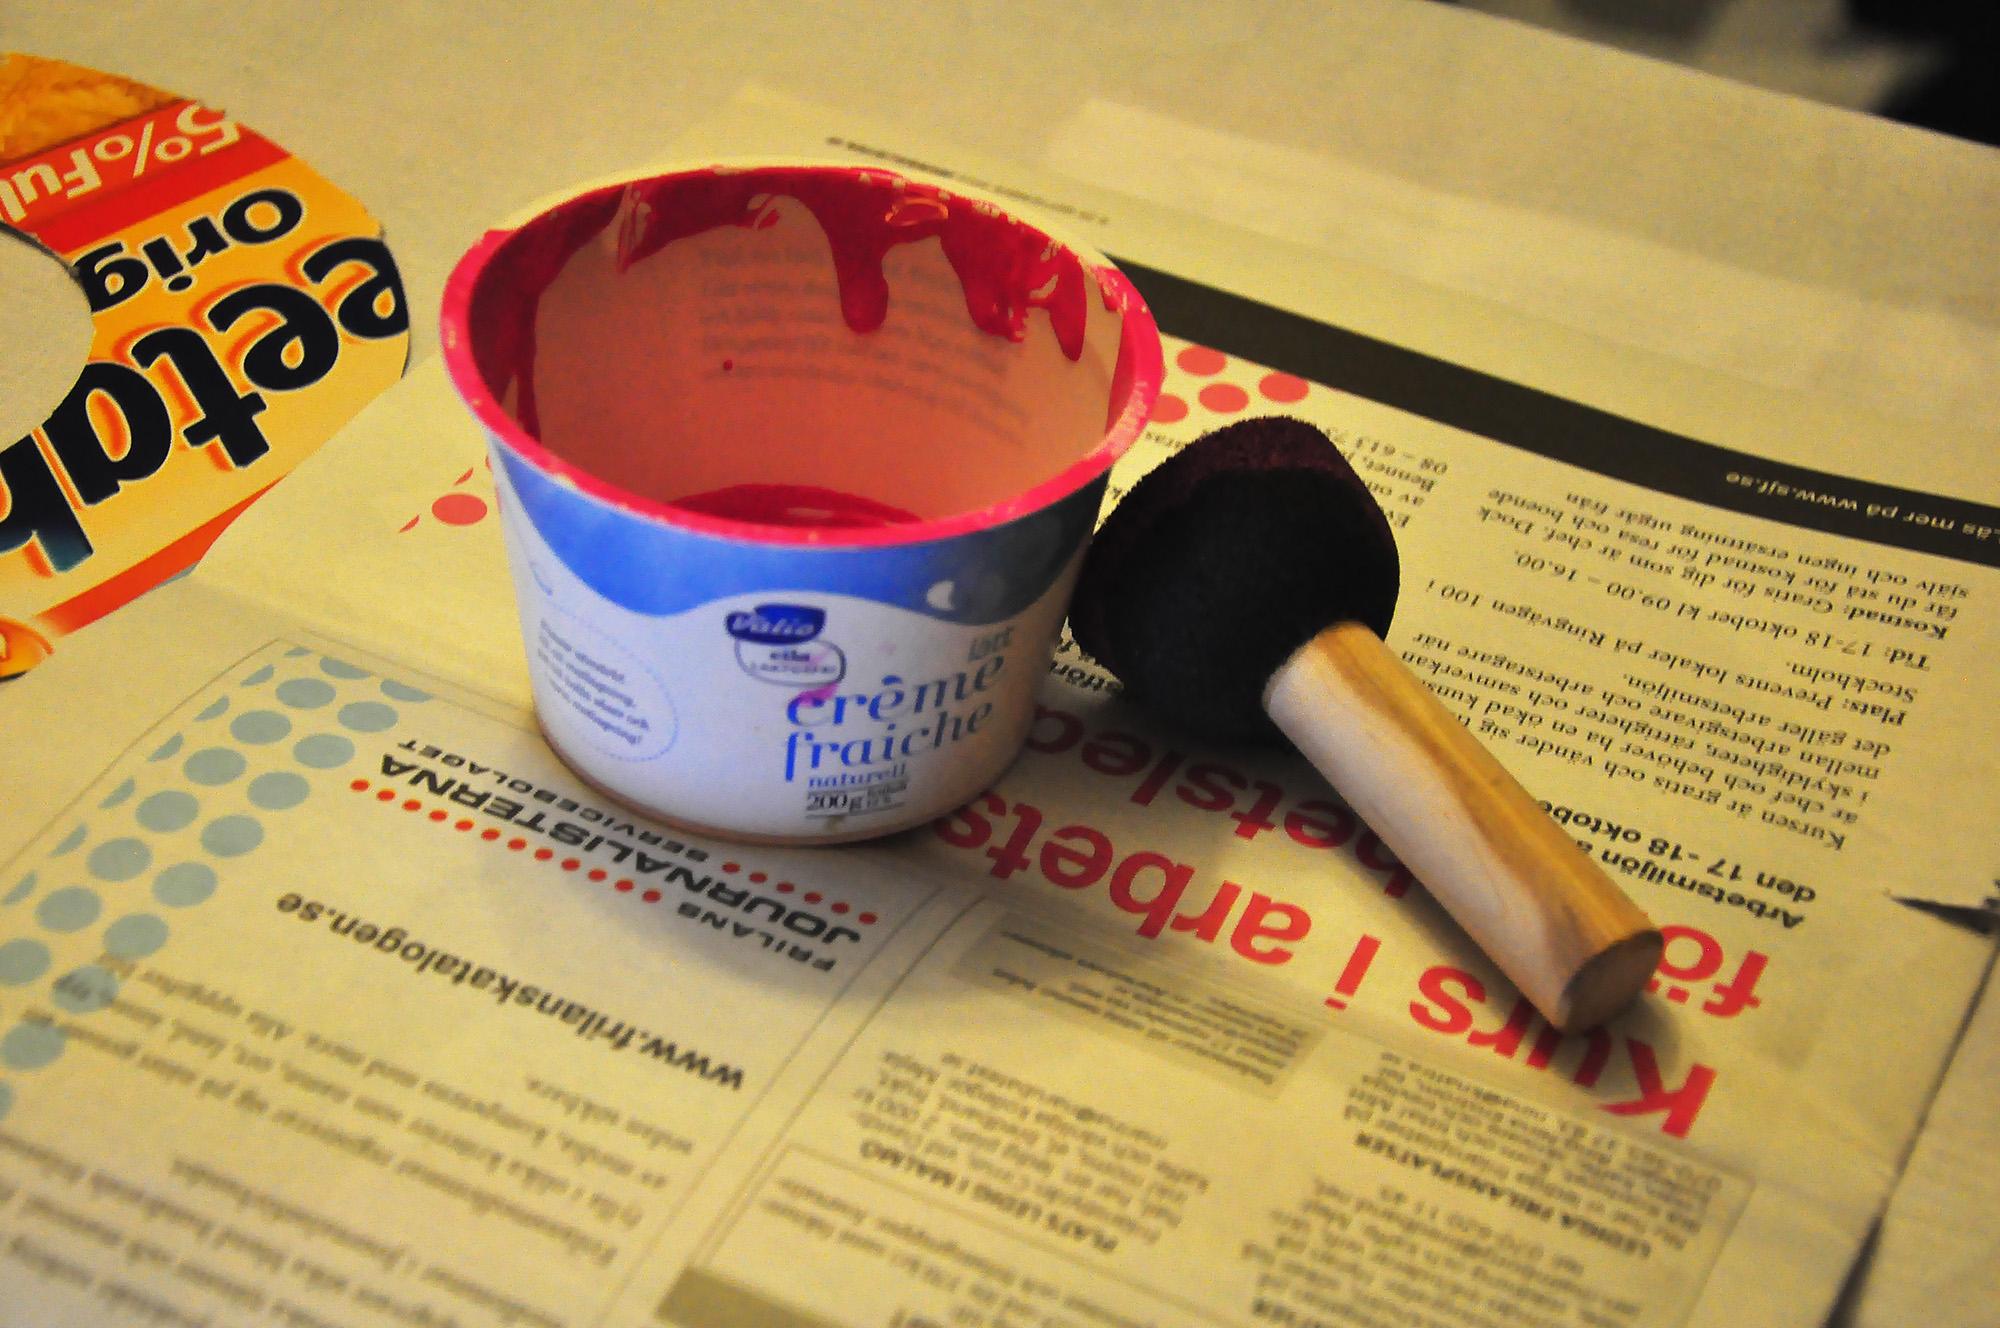 Printing on fabric using stencils